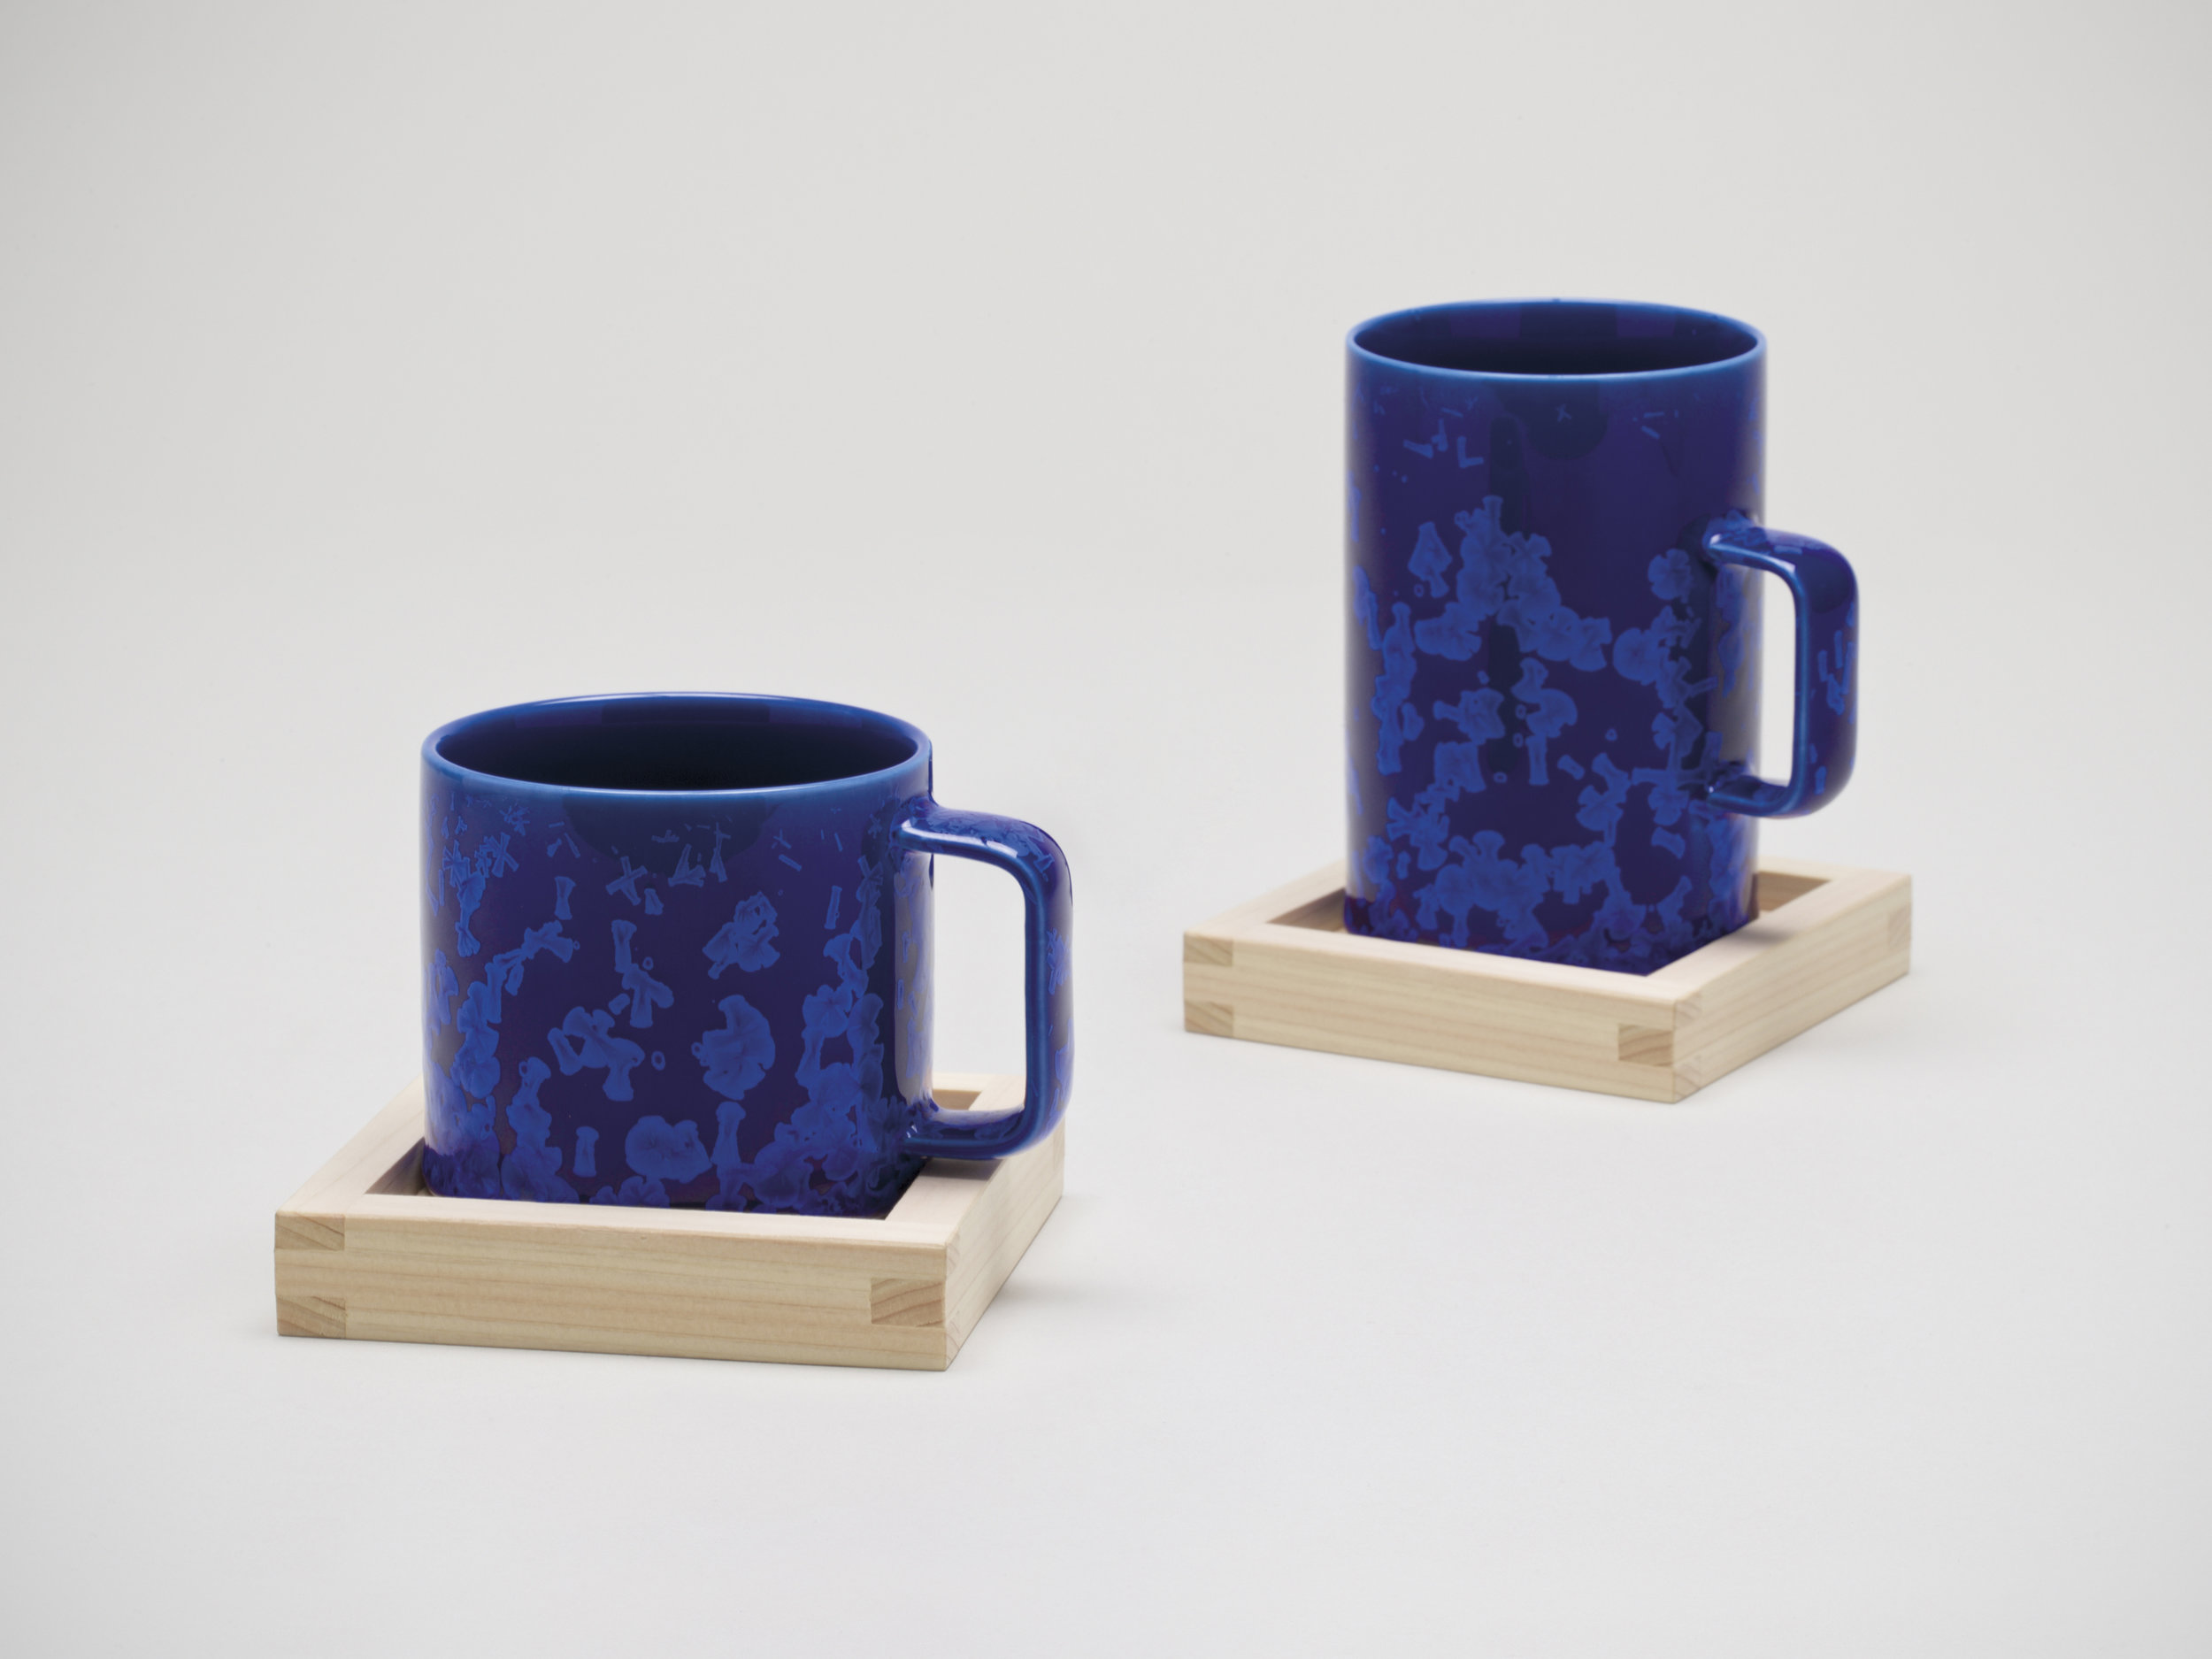 Crystalline Mugs by Jyusengama for the Sebastian Conran Gifu Collection